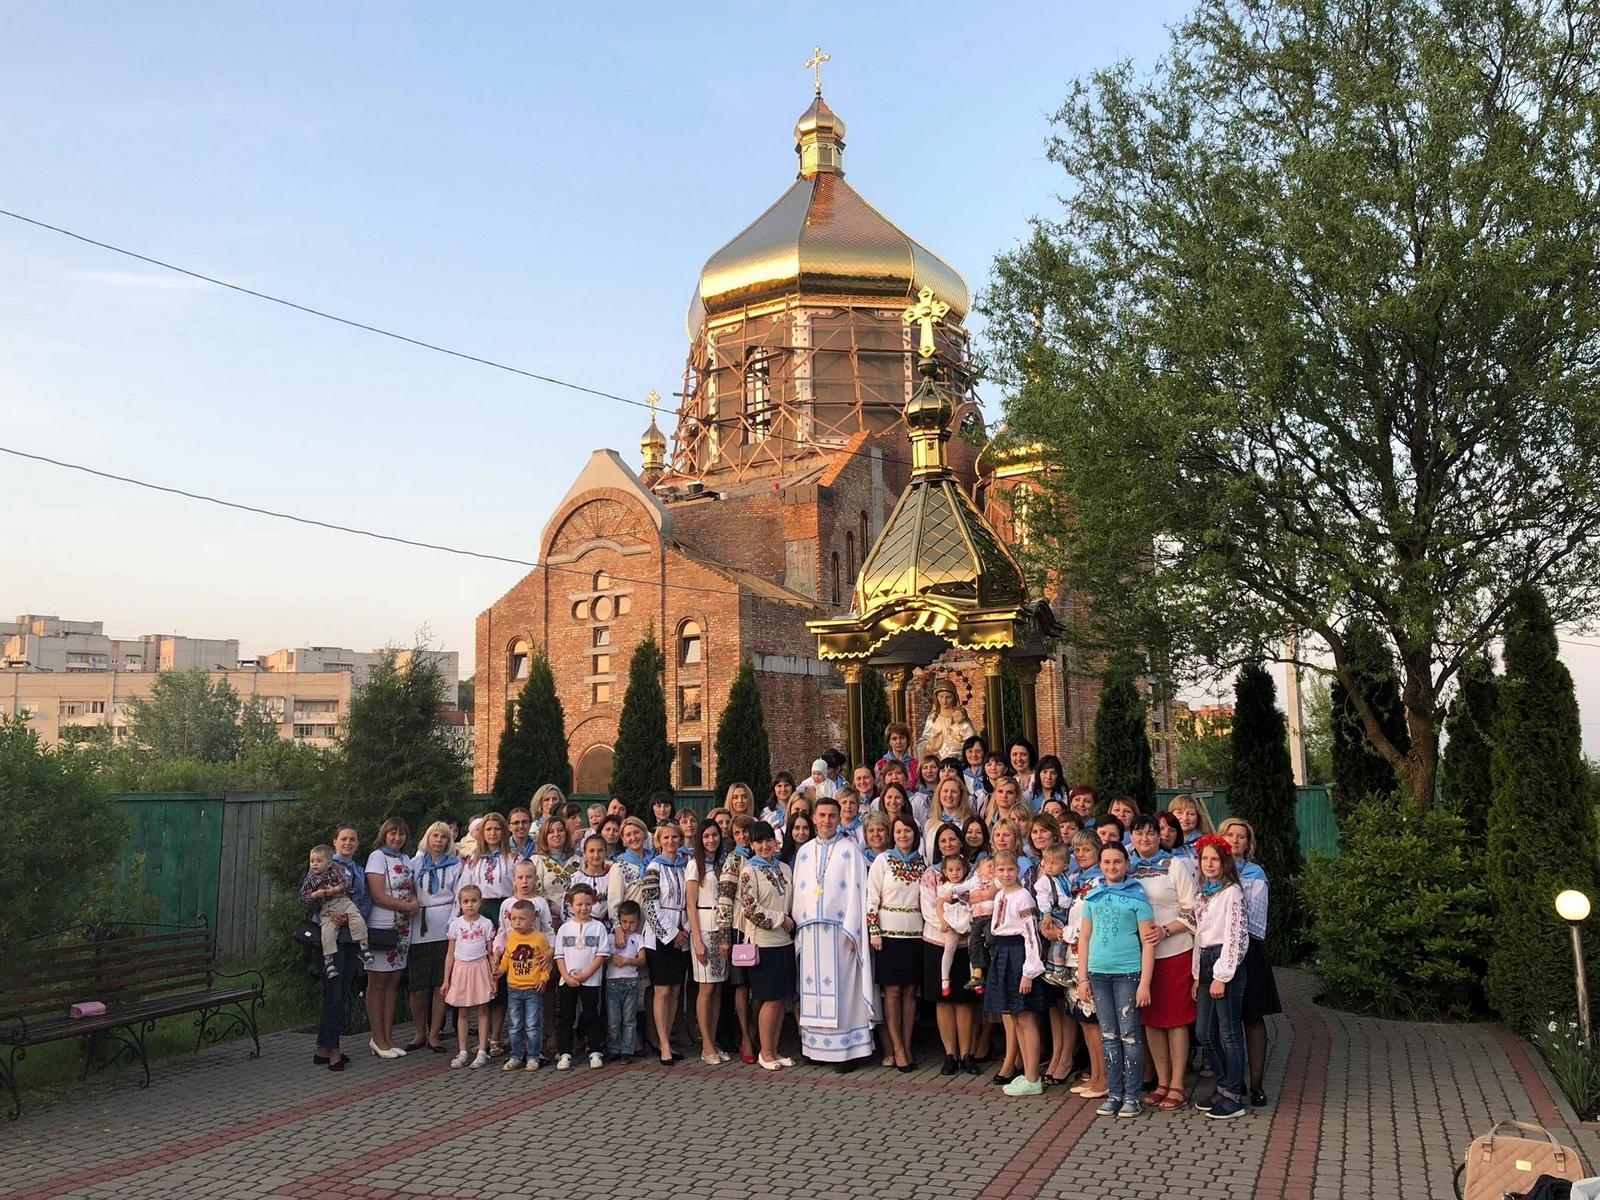 ditu_neporochnoi_2018-22.jpg